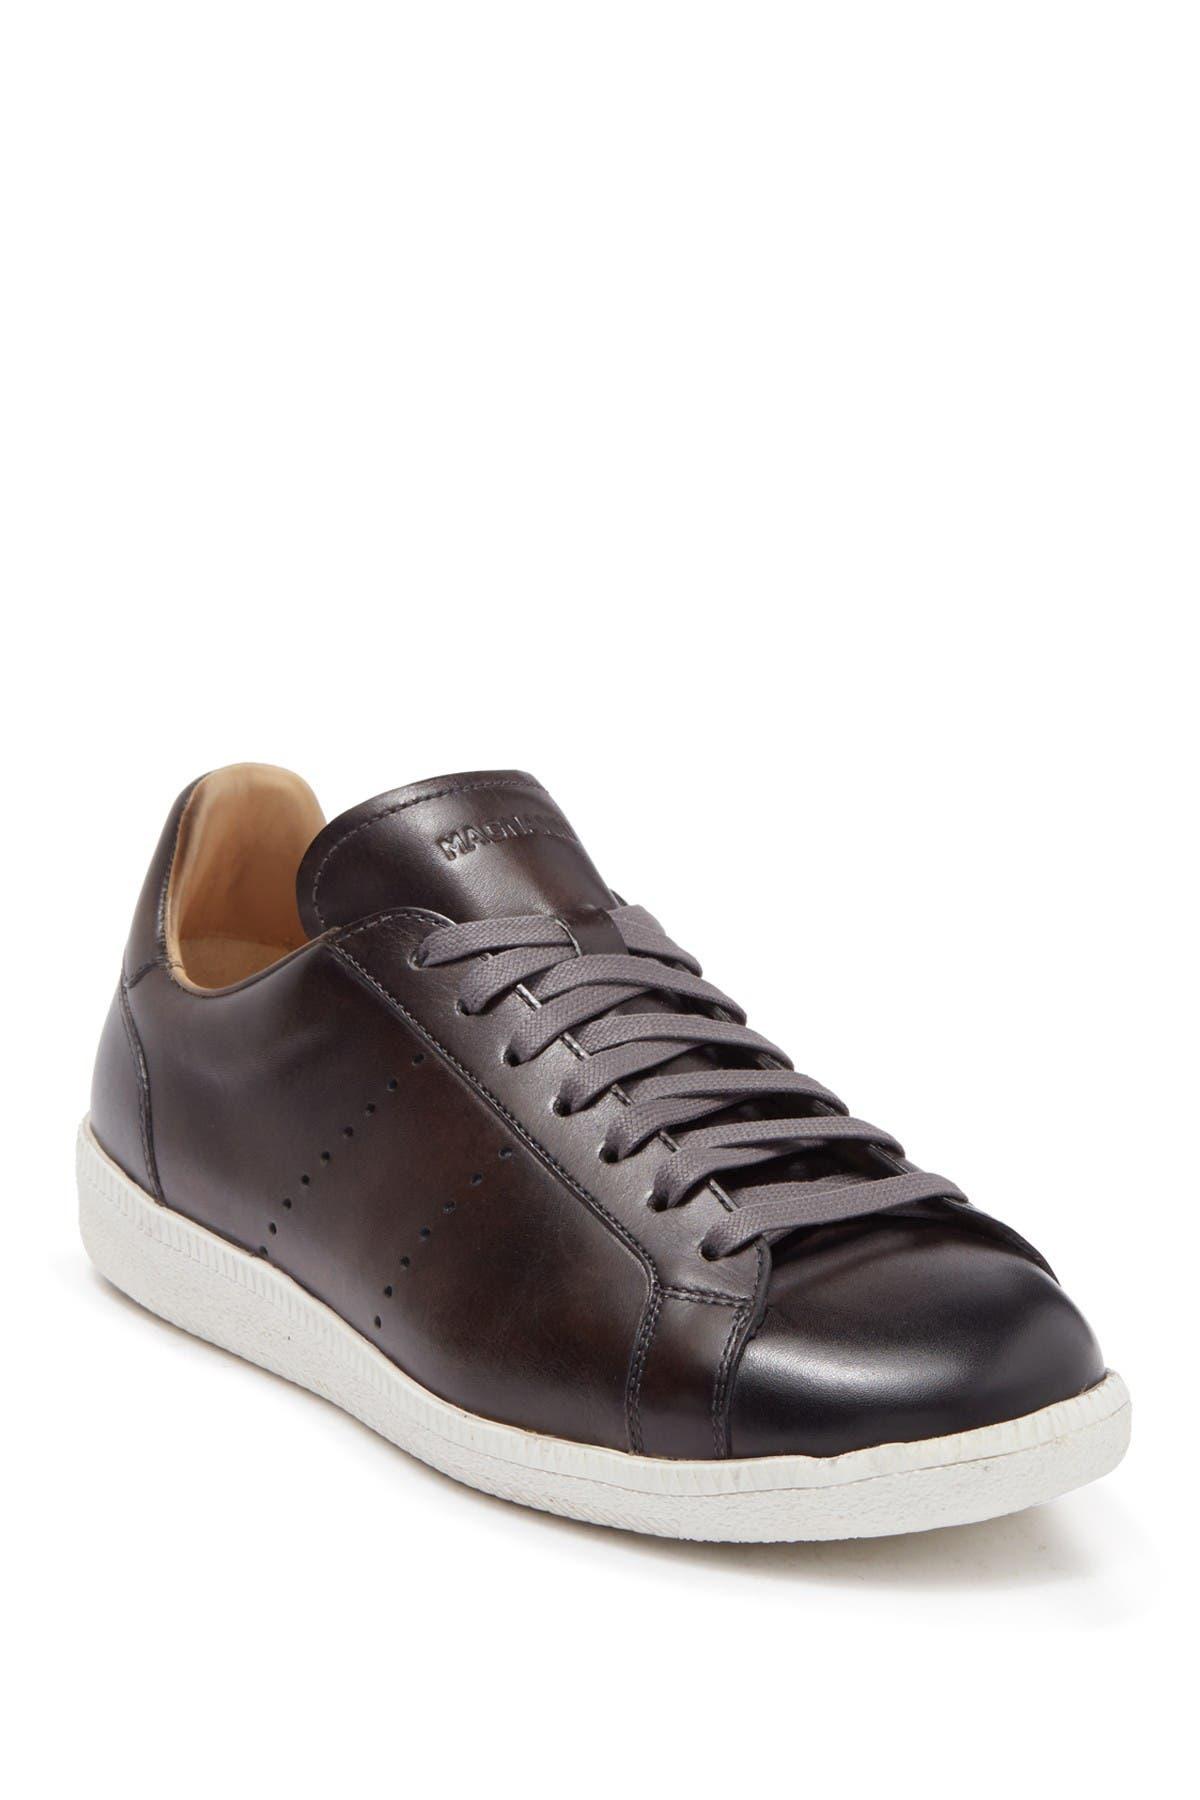 Image of Magnanni Leland Sneaker